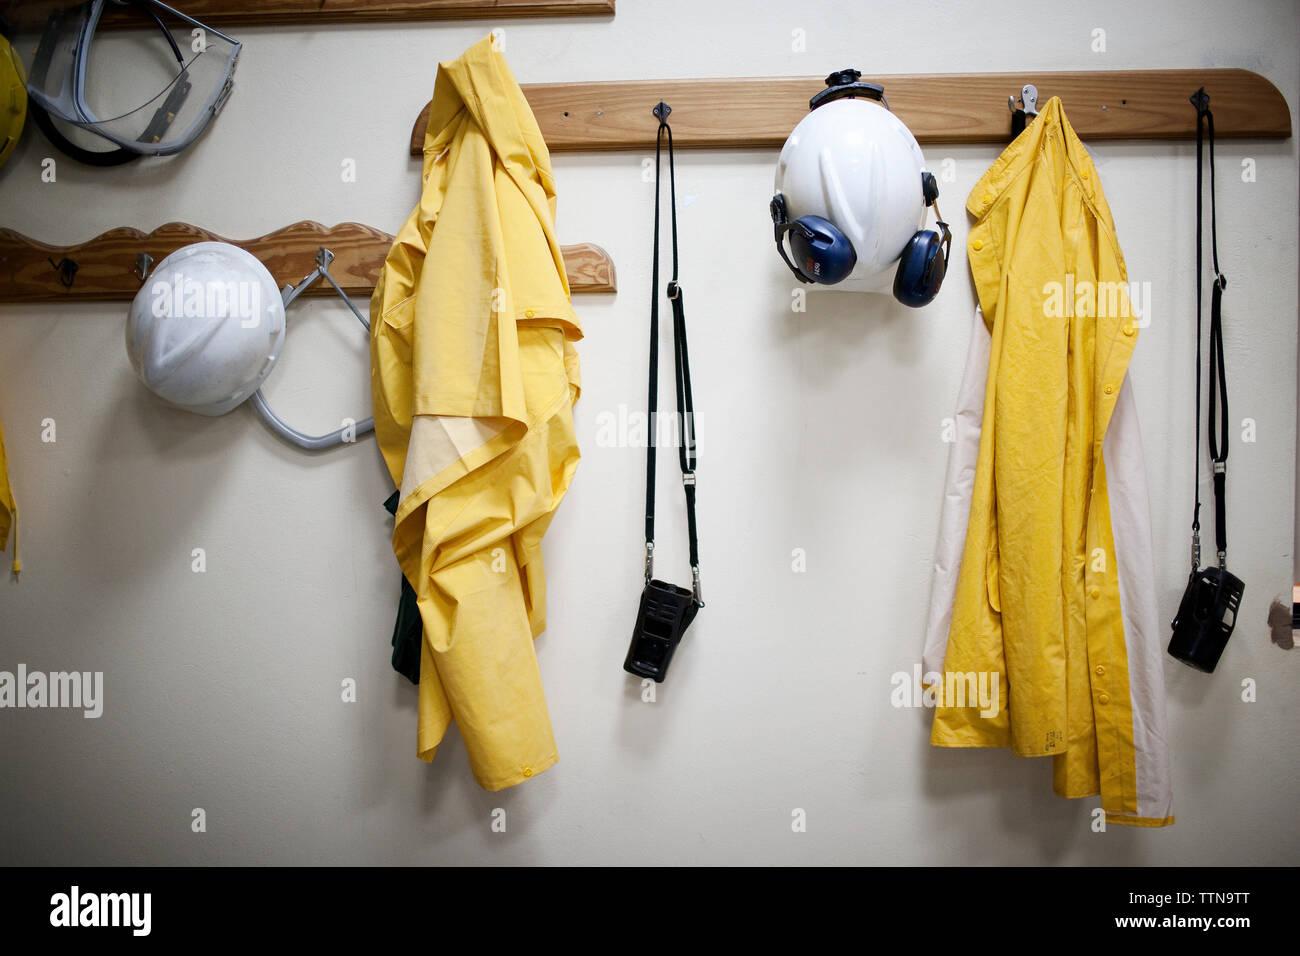 Protective workwear hanging from coat hooks - Stock Image